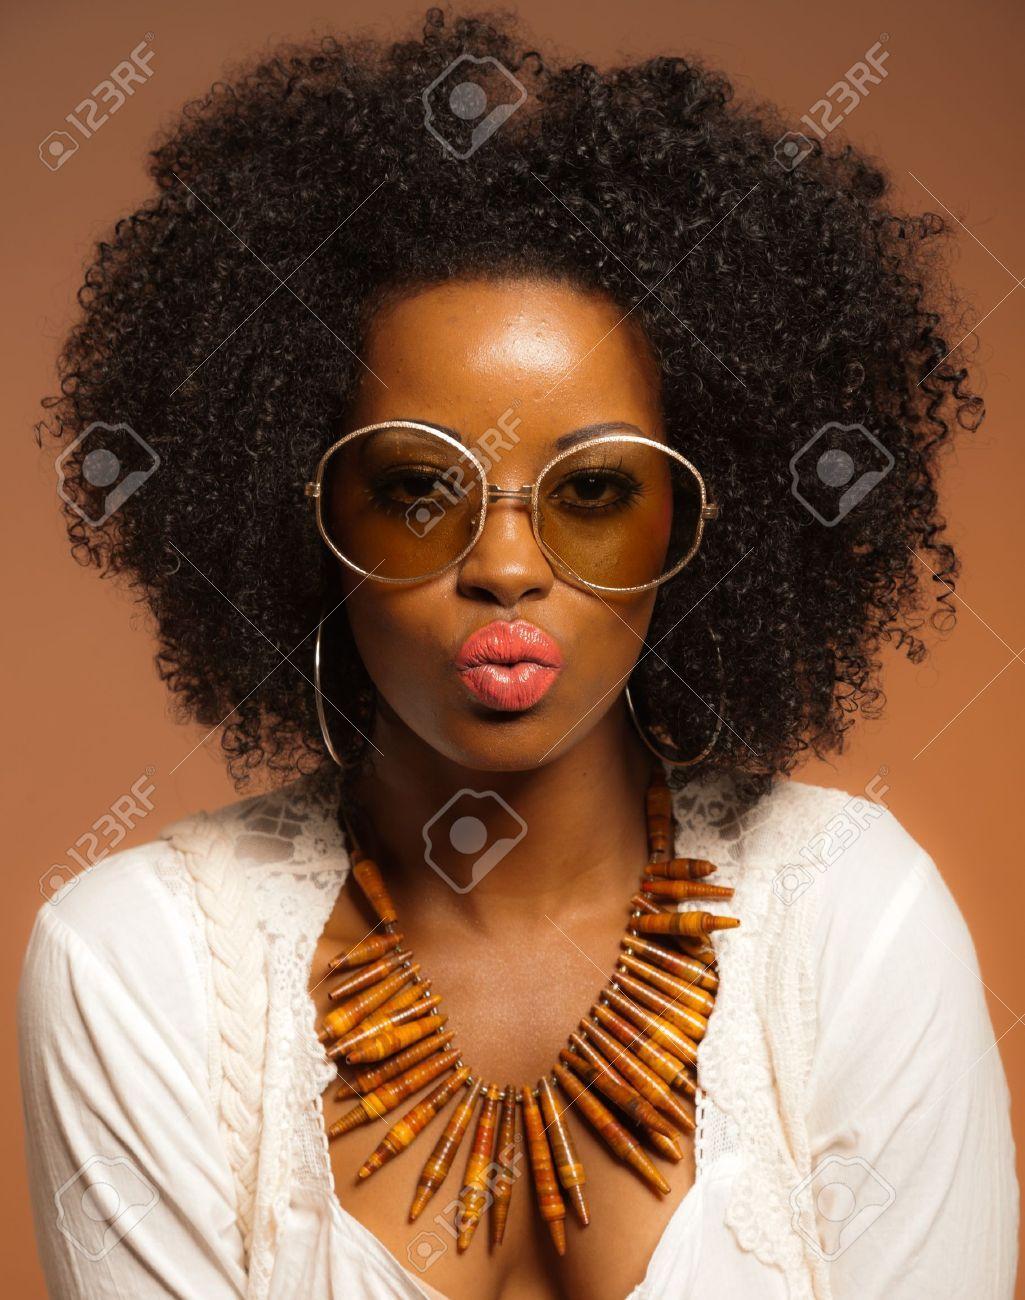 Retro 70s Fashion Black Woman With Sunglasses And White Shirt Black Fashion 70s Fashion Retro Sunglasses